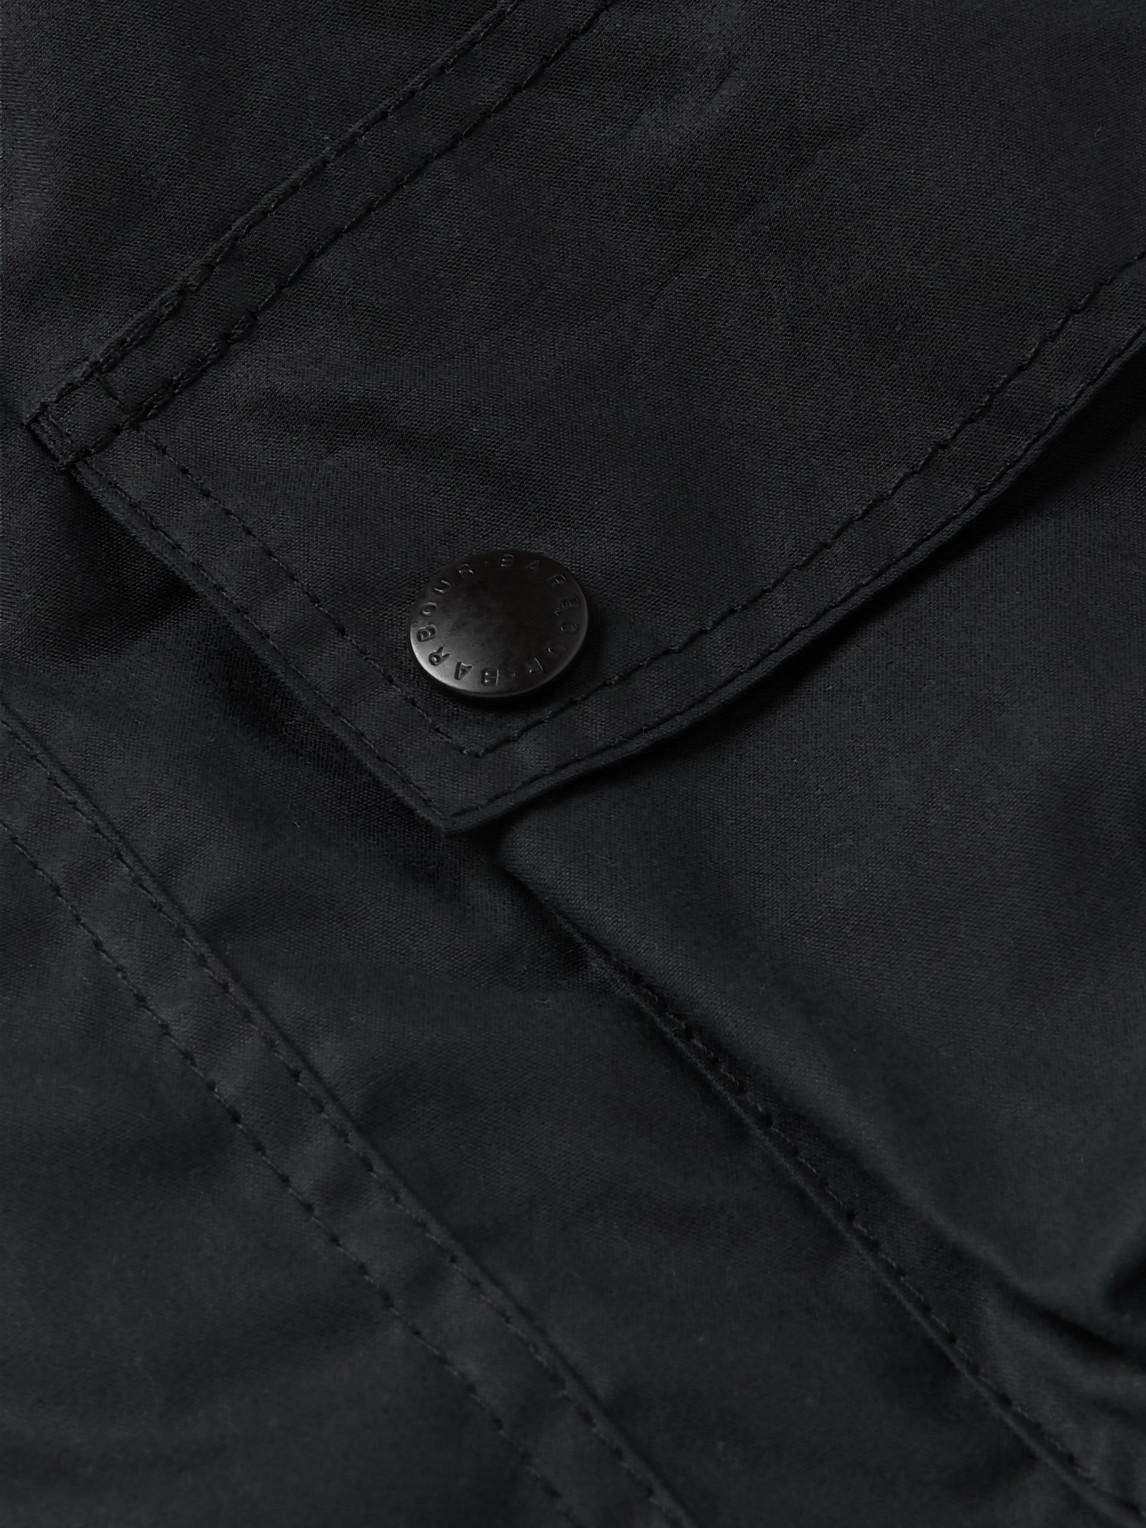 Barbour White Label - White Label Ursula Slim-fit Waxed-cotton Hooded Jacket - Blue - L - Men